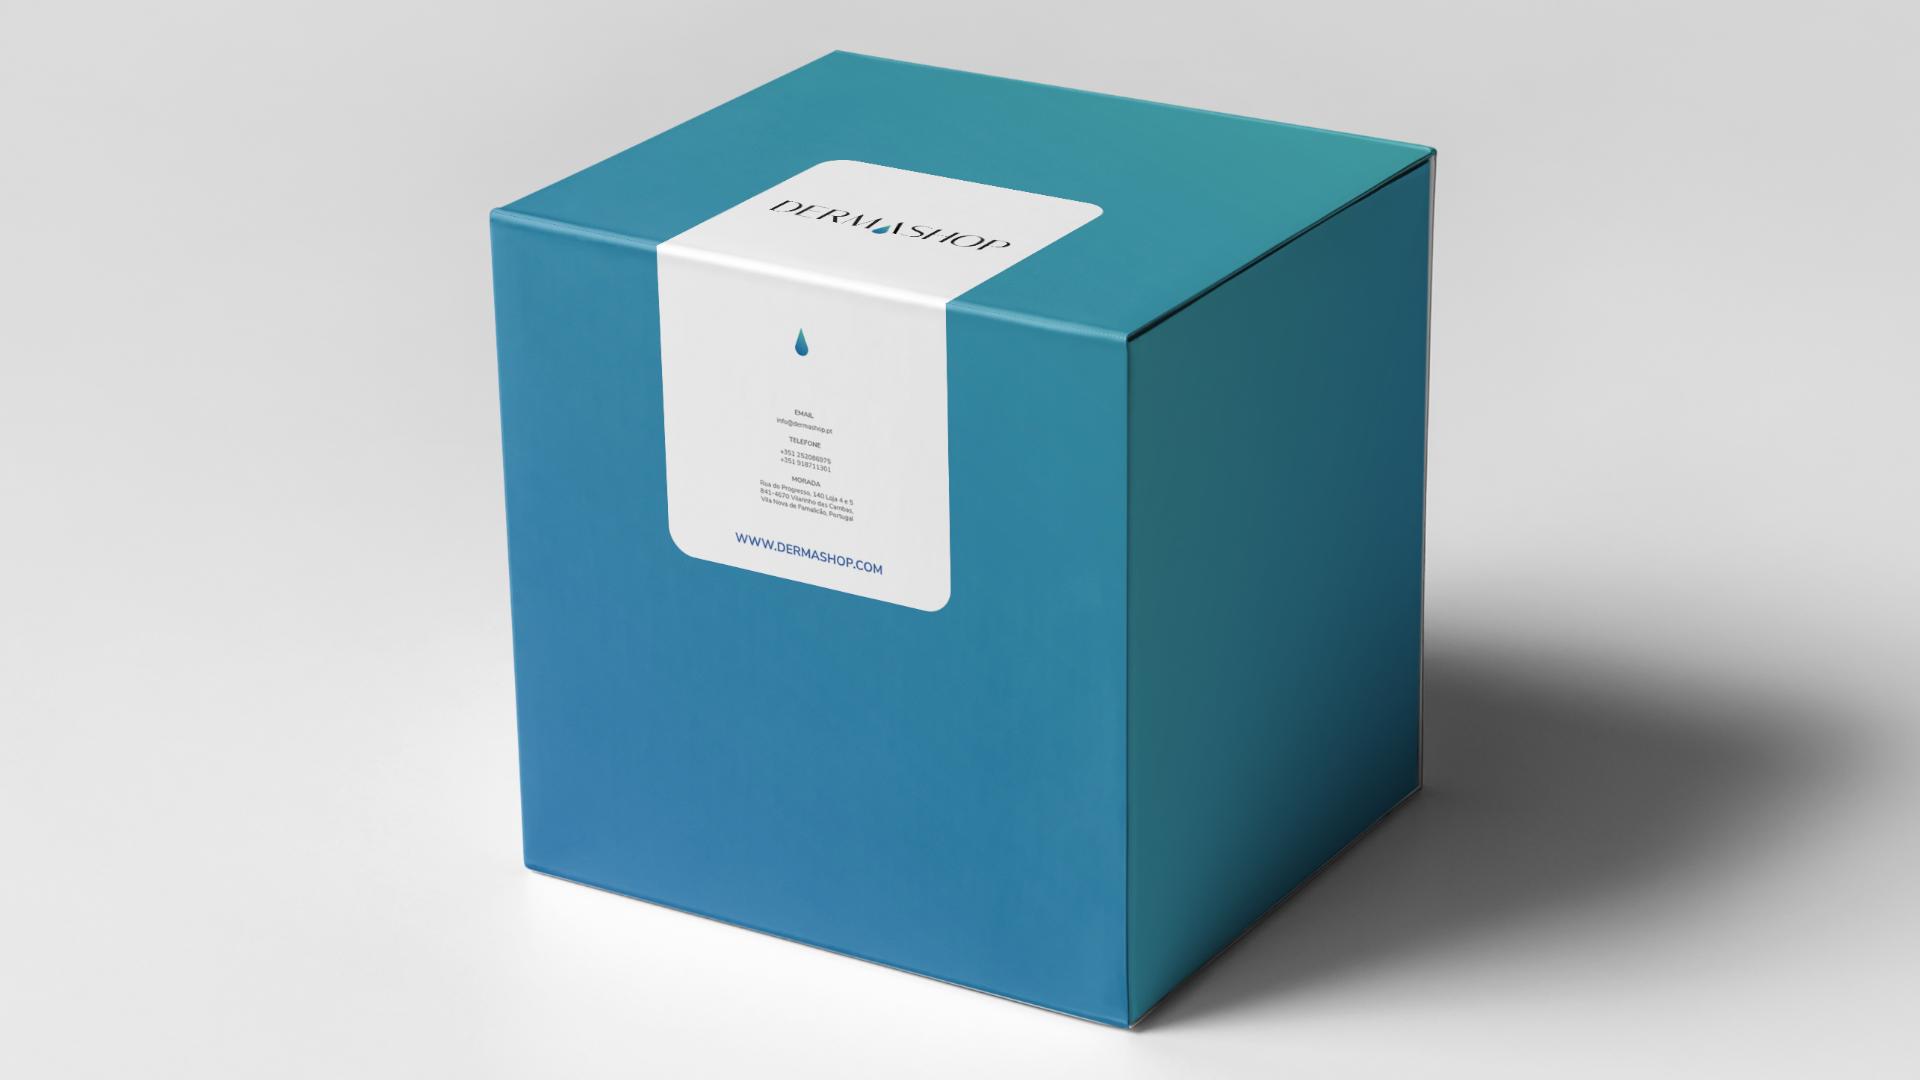 Branding e packing dermashop